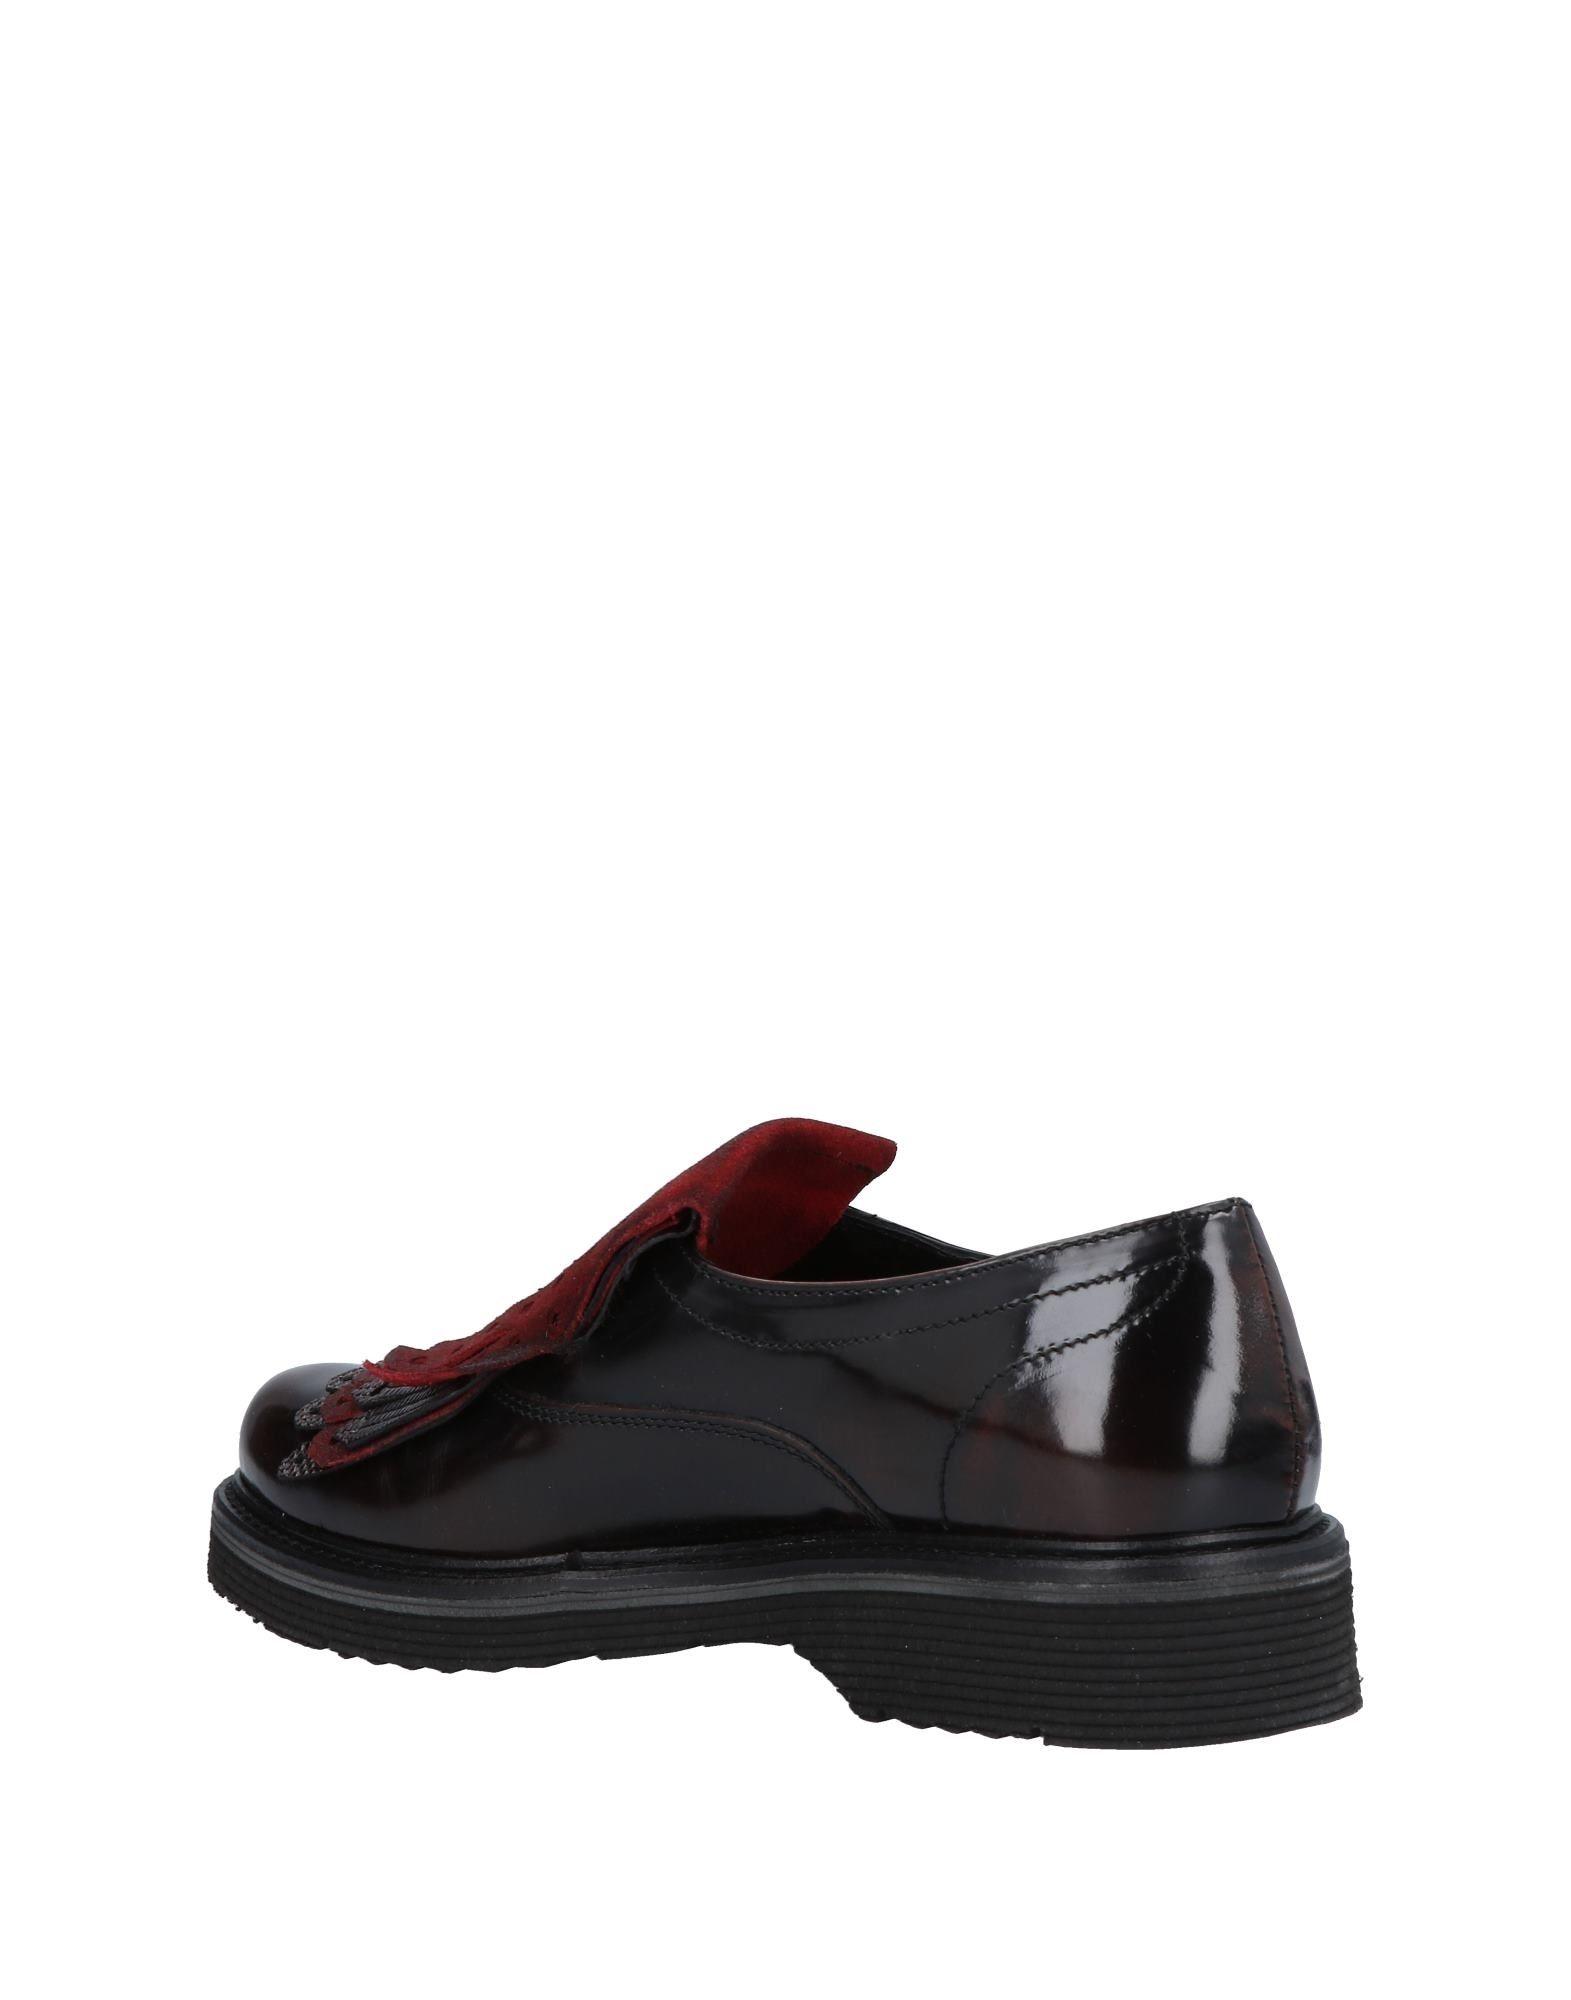 Nicola Barbato Mokassins Mokassins Barbato Damen  11467189HF Gute Qualität beliebte Schuhe fbc562